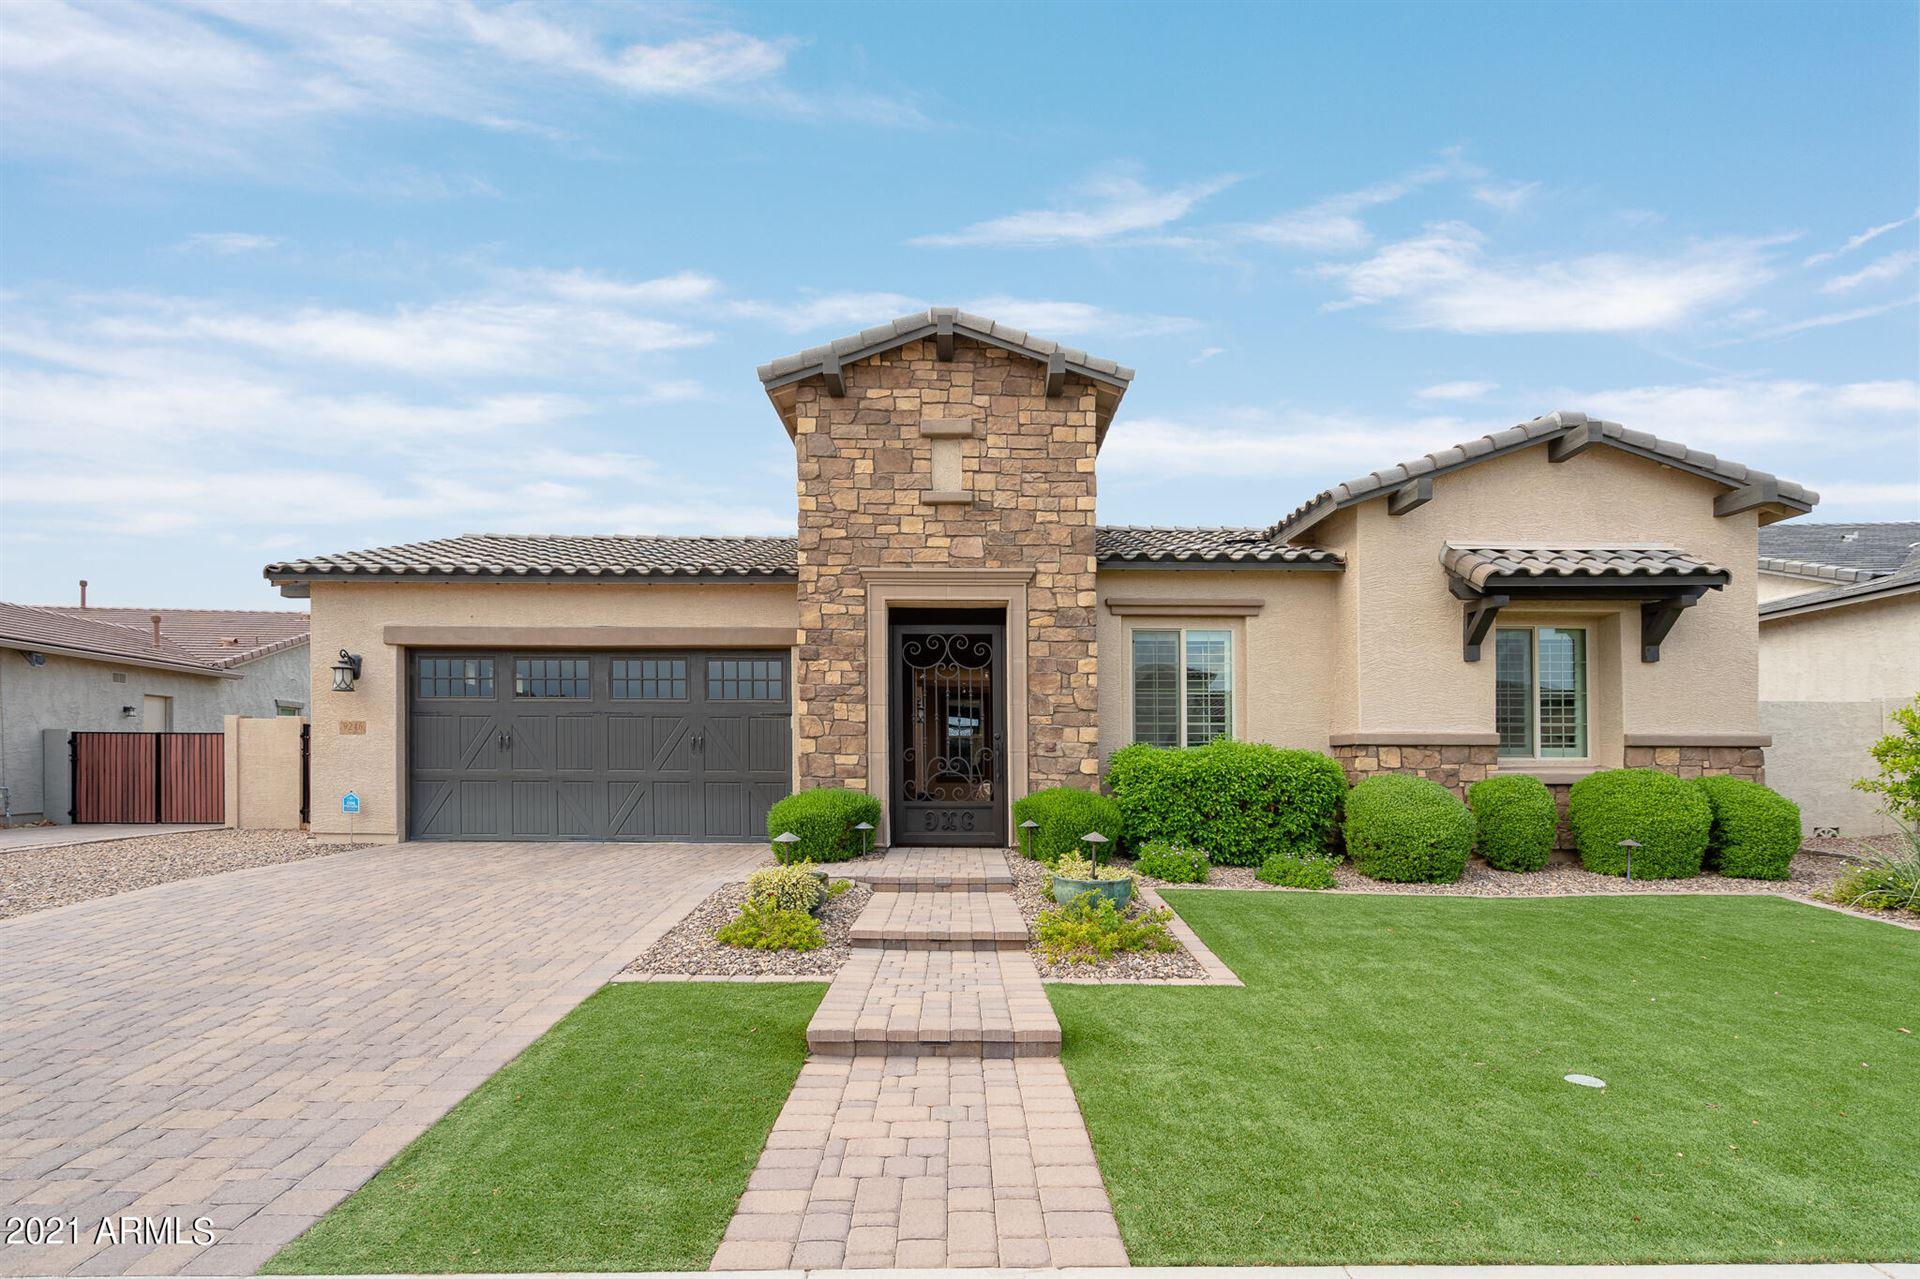 Photo of 9246 W SANDS Drive, Peoria, AZ 85383 (MLS # 6269169)